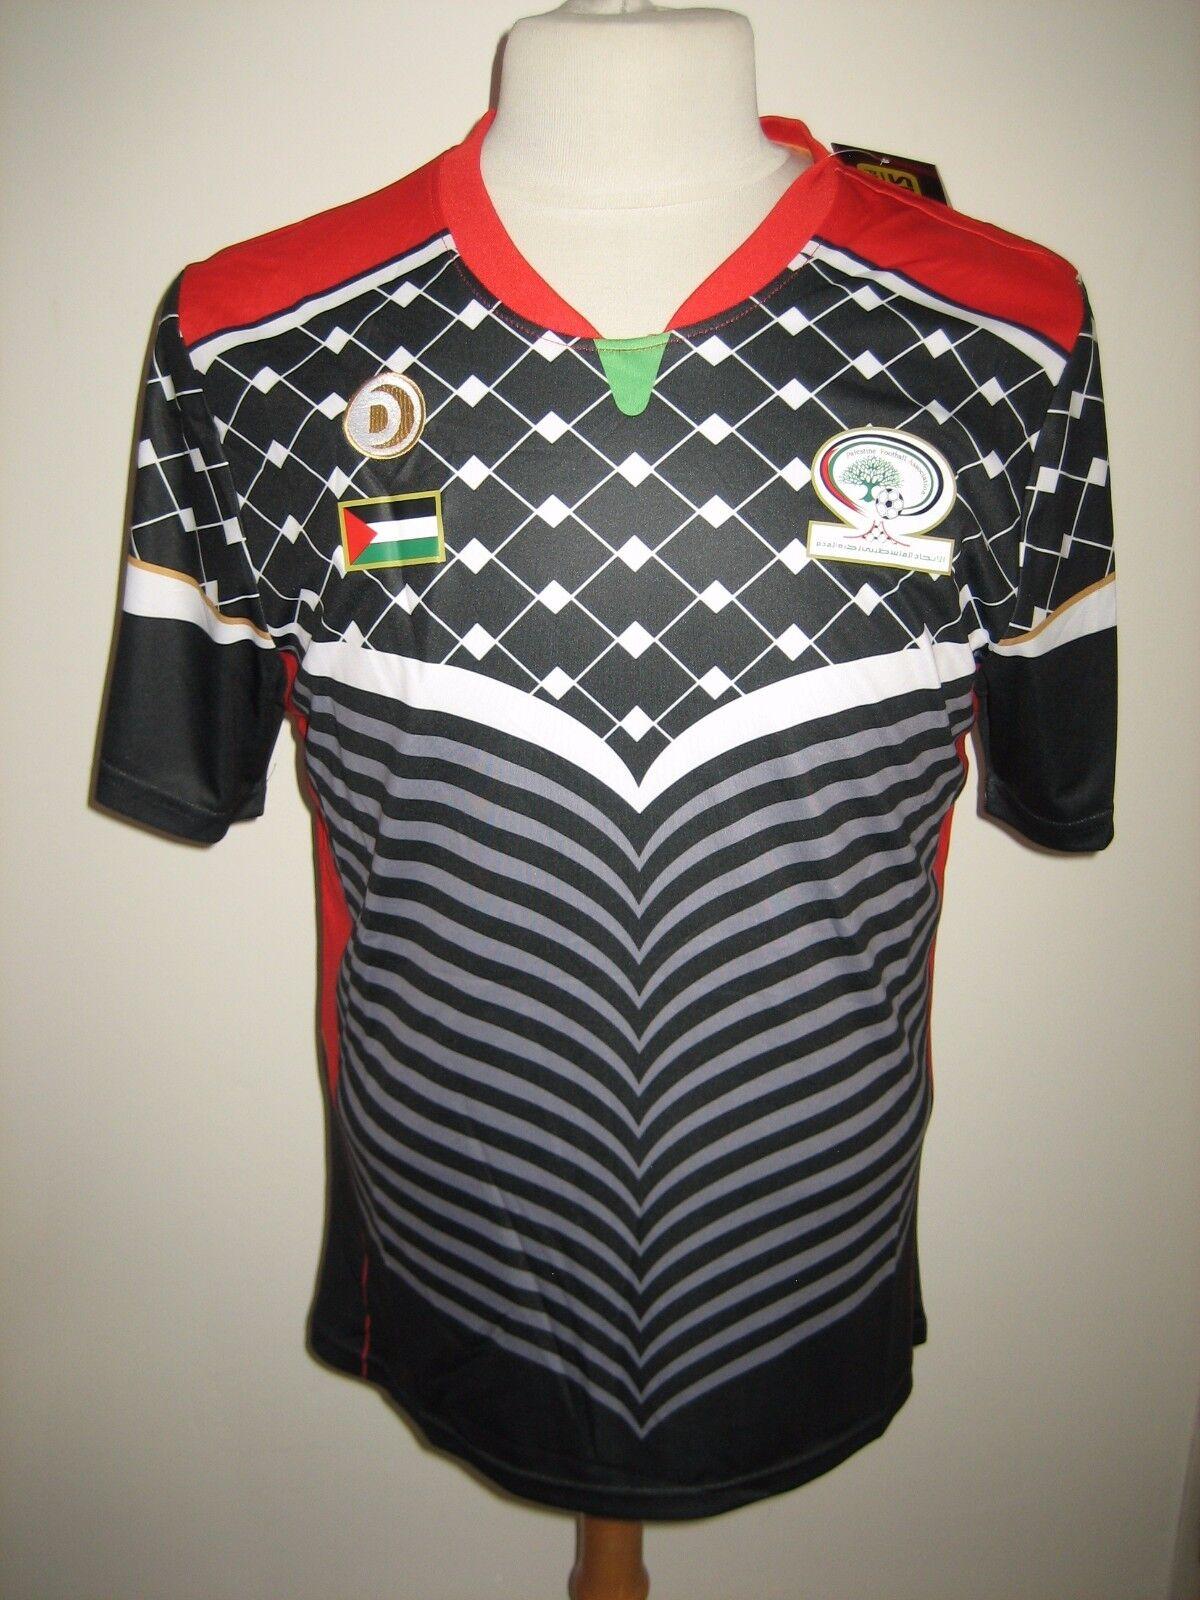 Palestine away rare footbtutti shirt soccer jersey maillot trikot camiseta Dimensione L